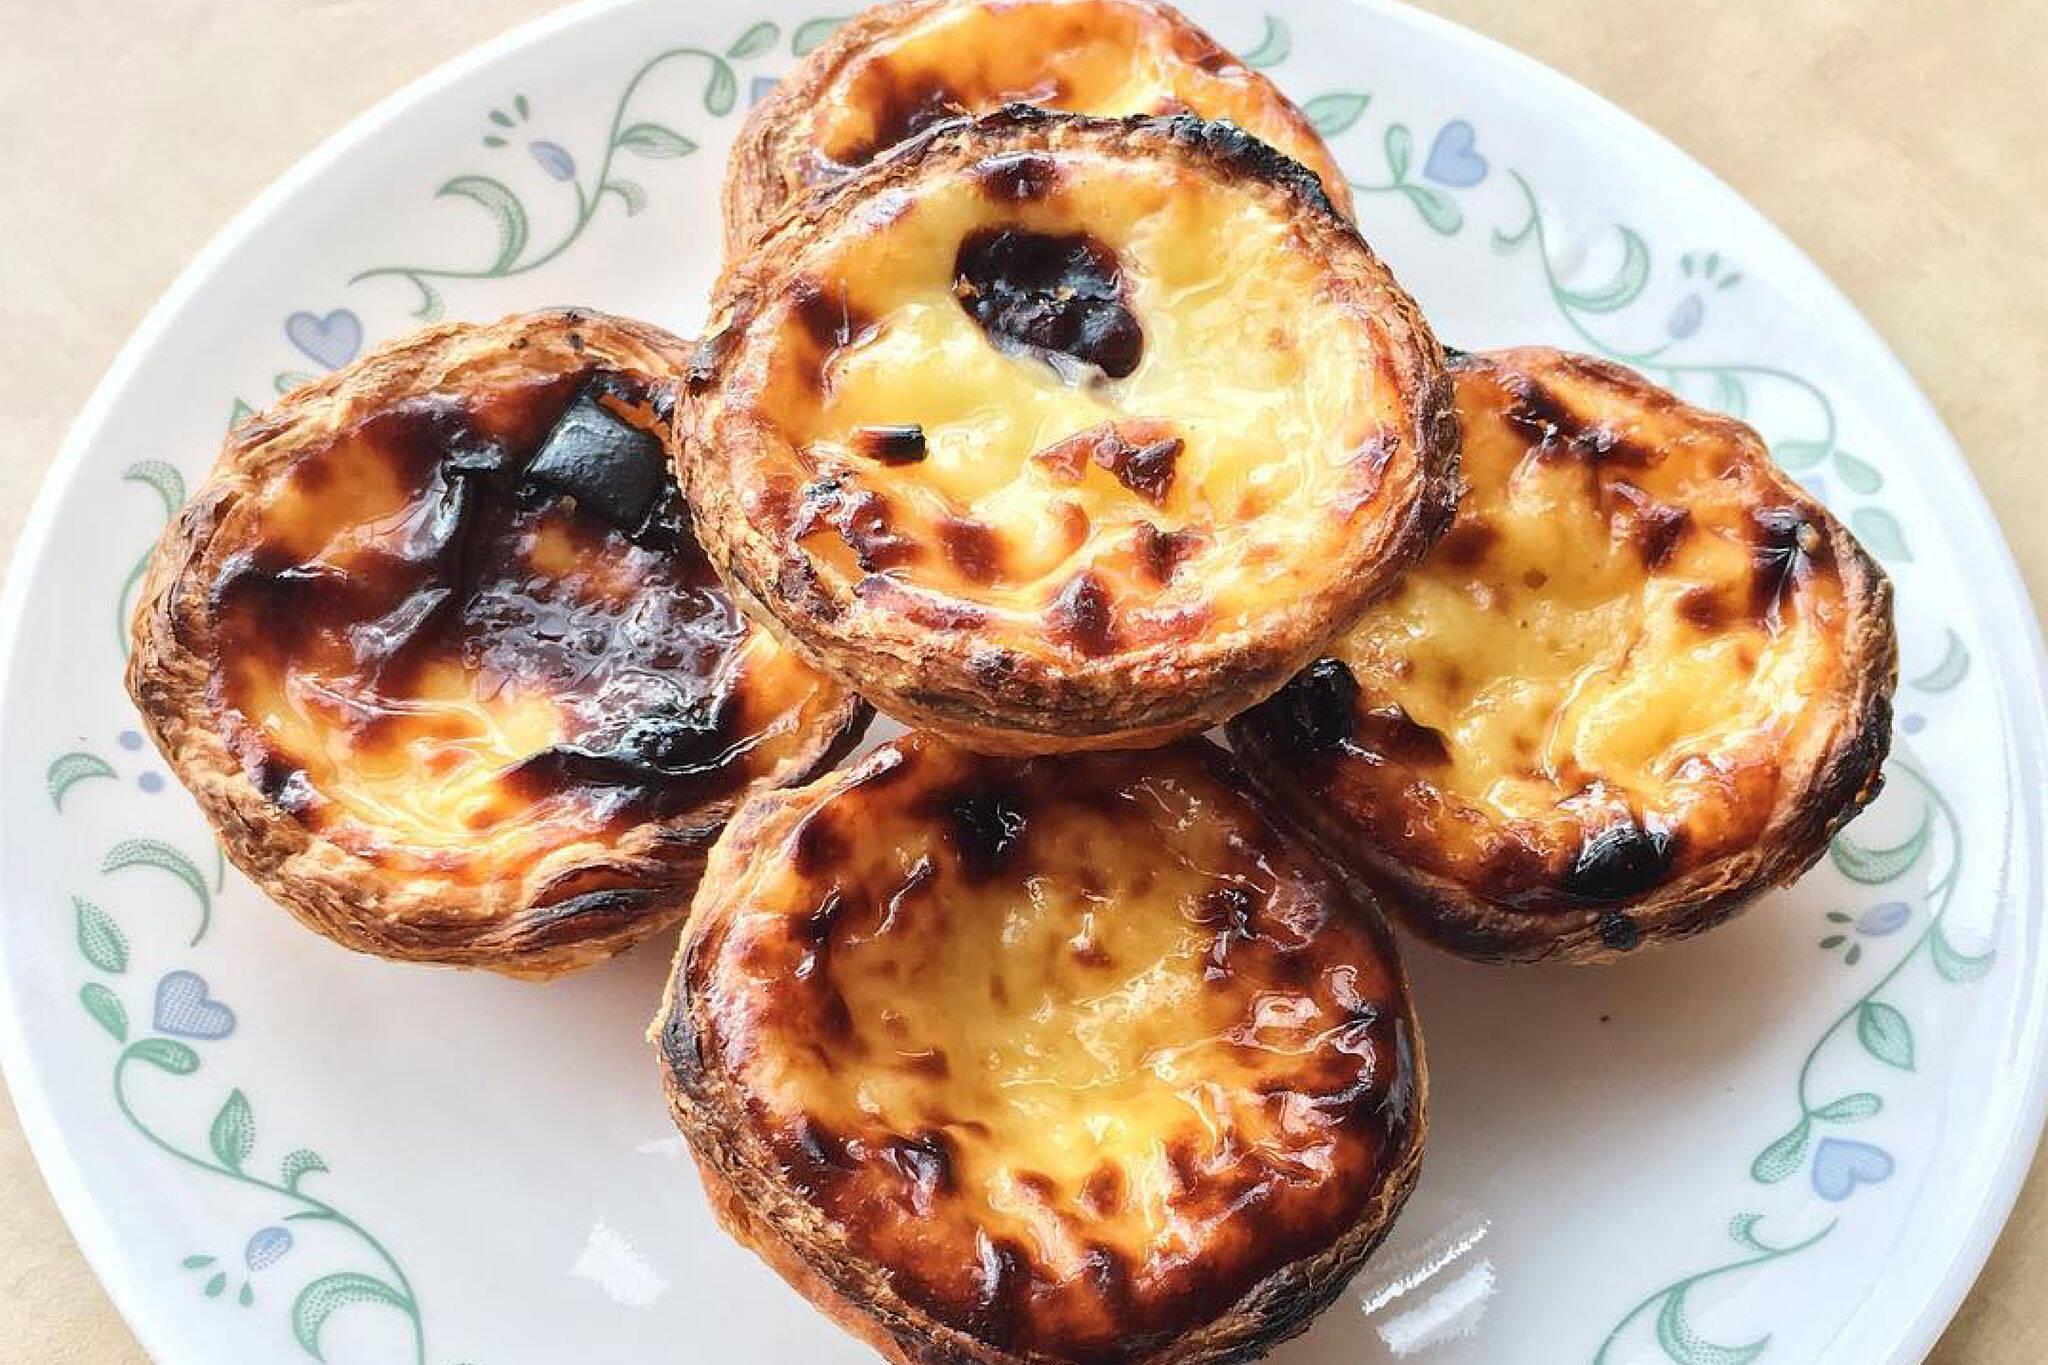 6be1eef86 The Best Portuguese Custard Tarts in Toronto